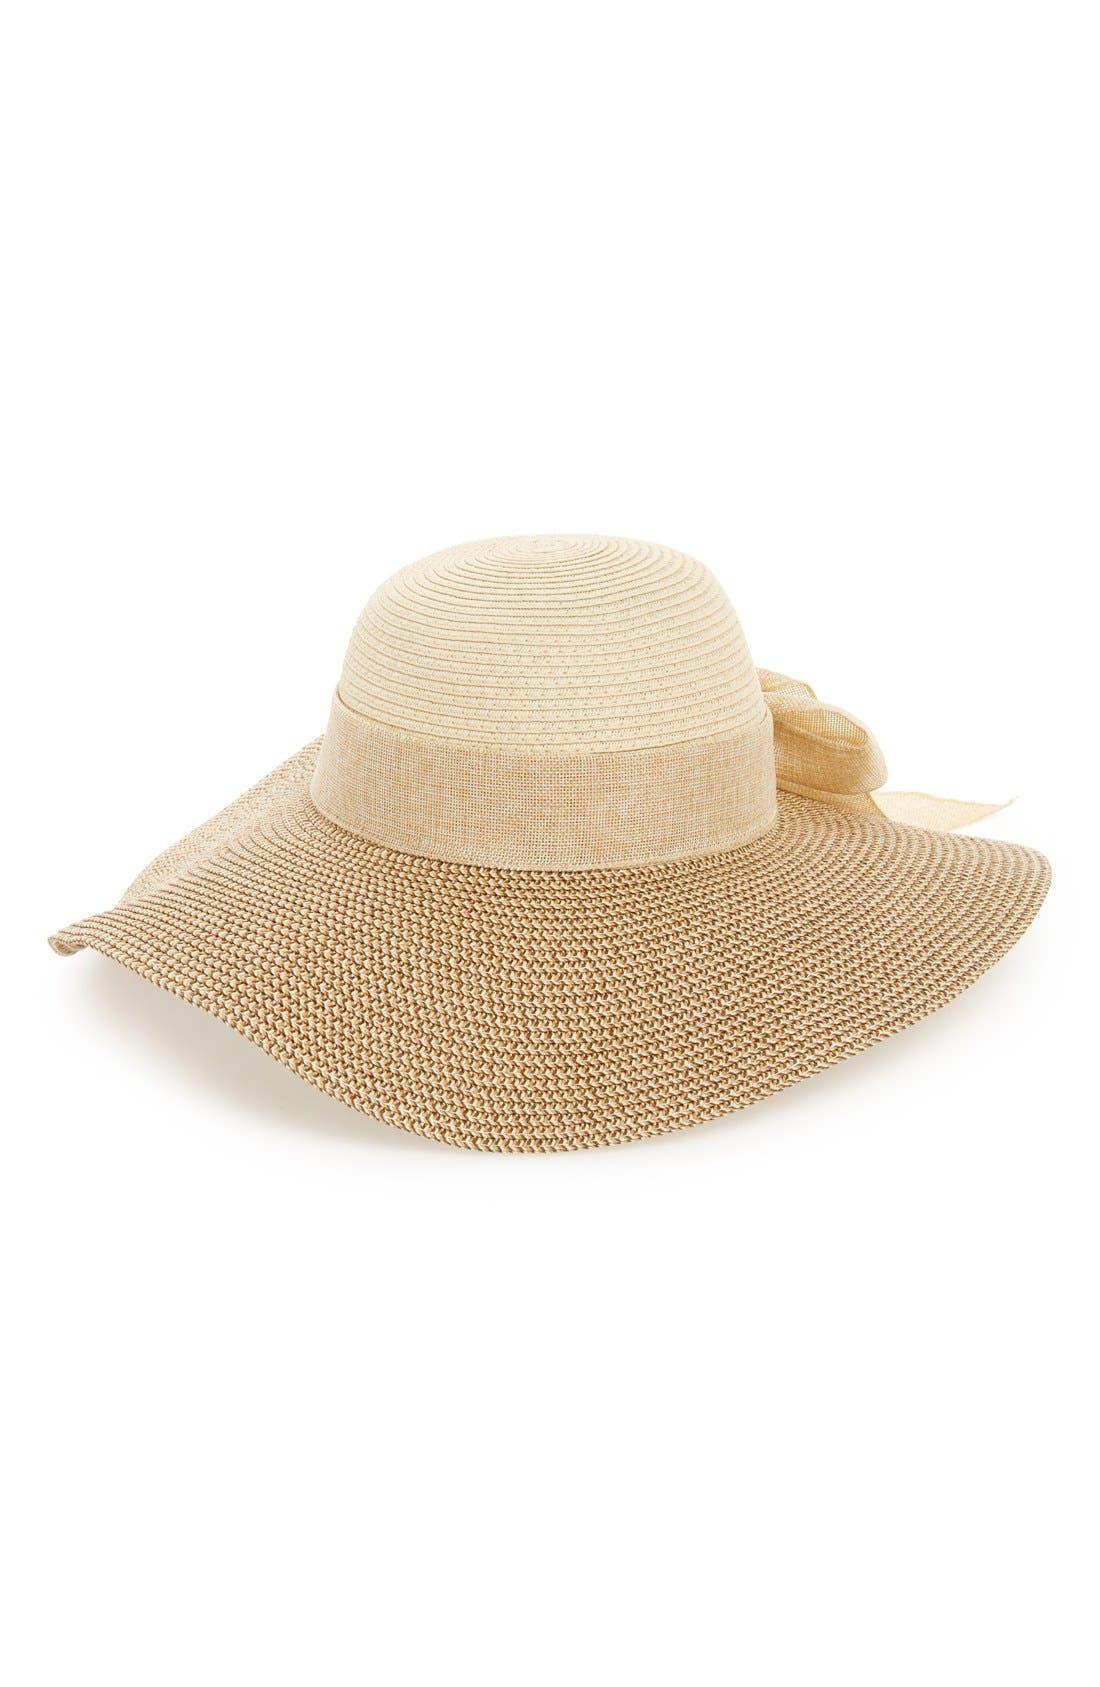 Floppy Straw Hat,                             Alternate thumbnail 3, color,                             260